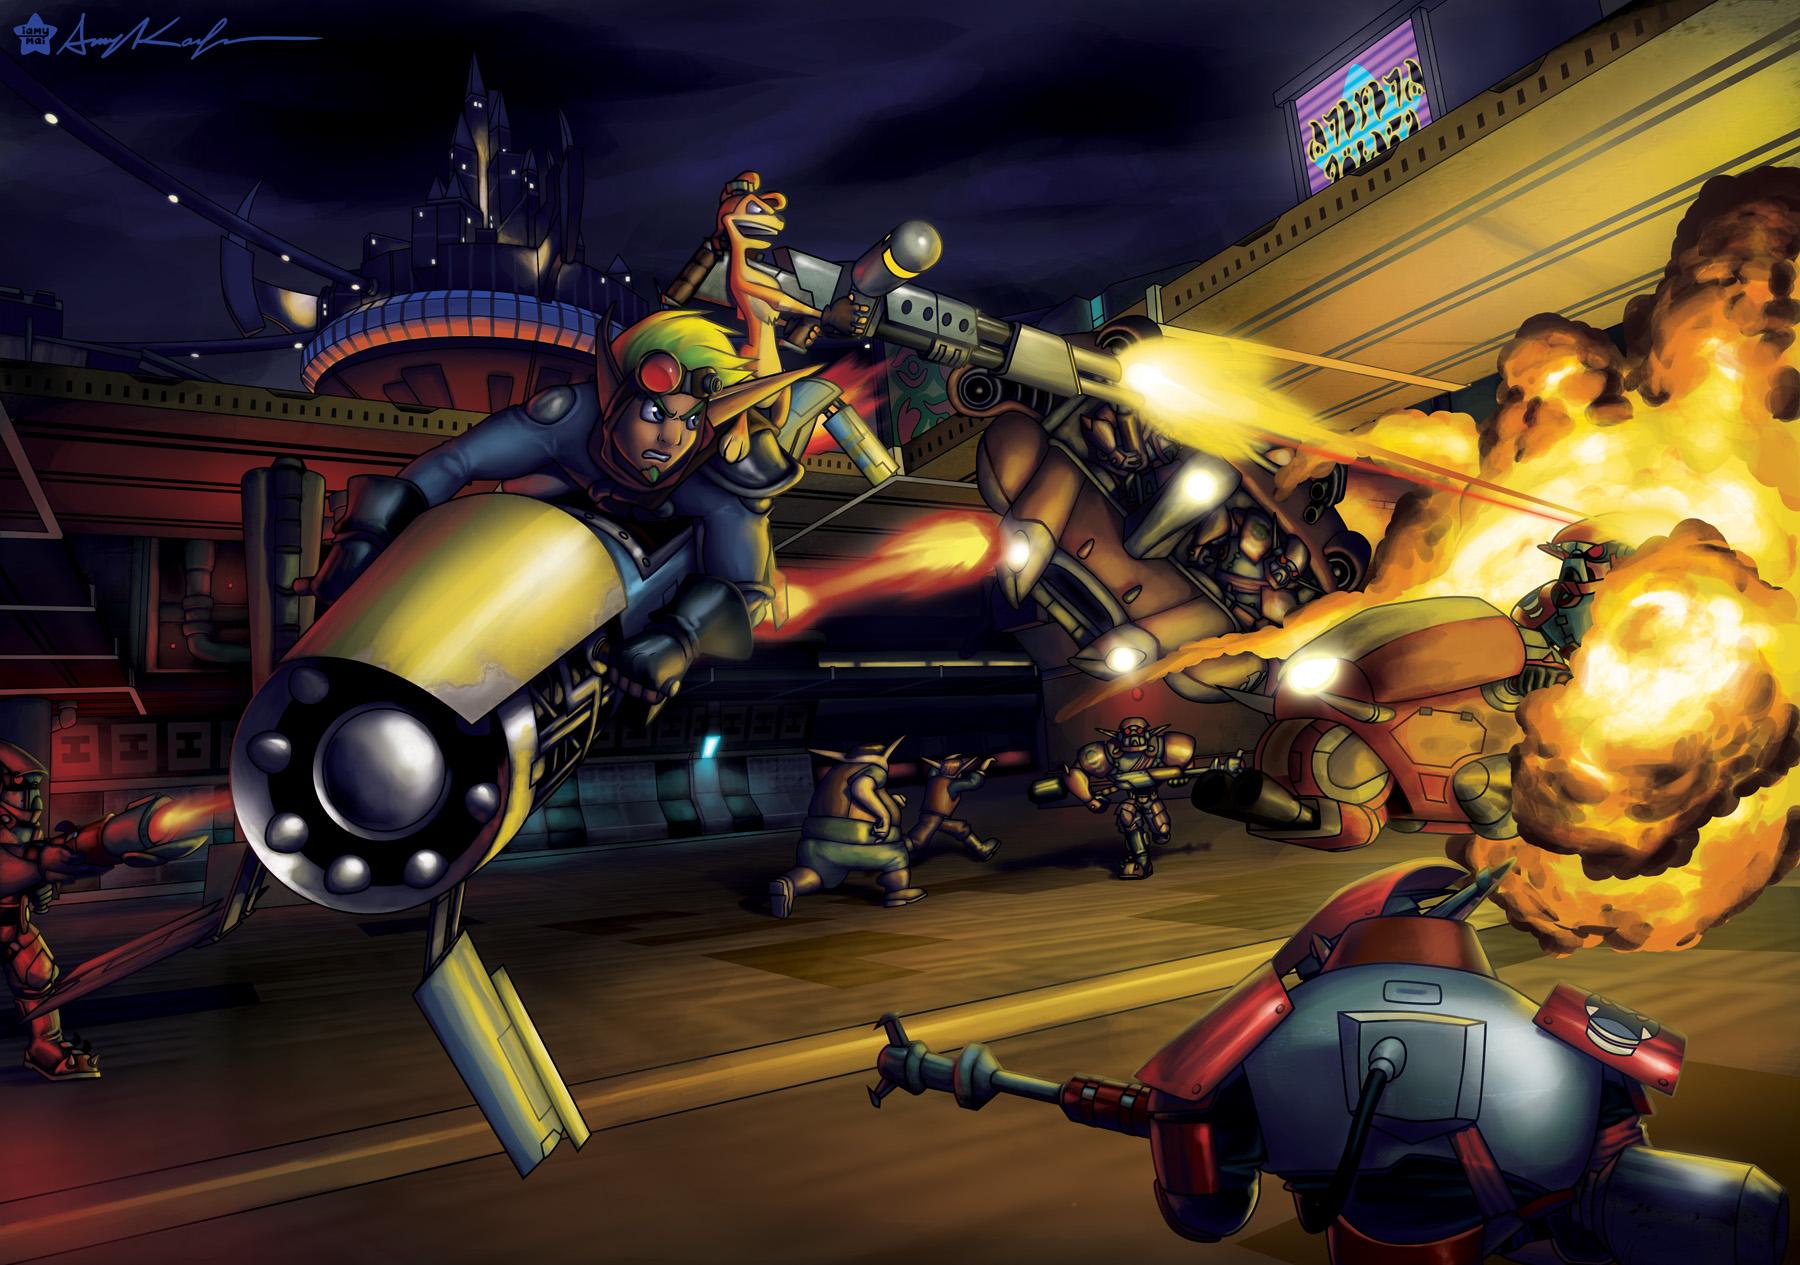 Destiny 2 Hd Wallpaper Jak And Daxter Wallpapers Hd Pixelstalk Net